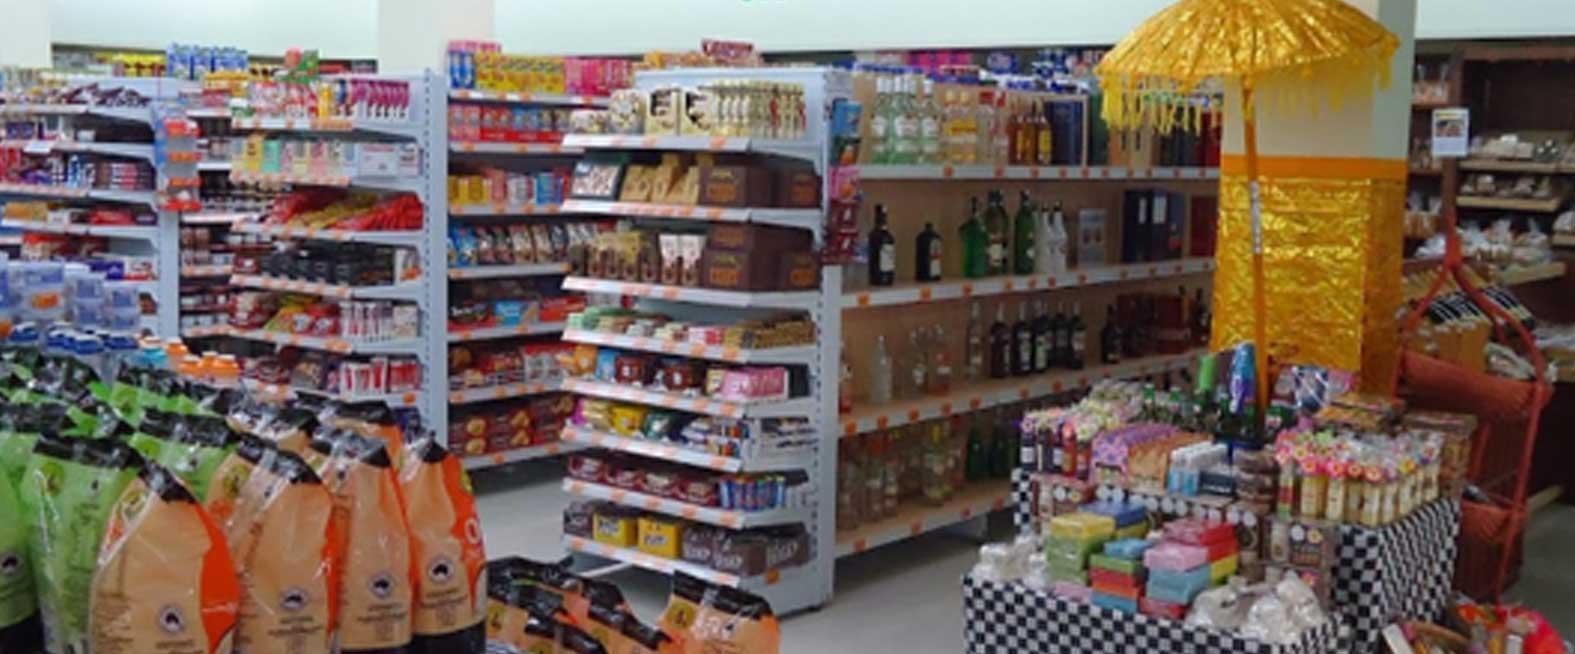 Frestive Supermarket